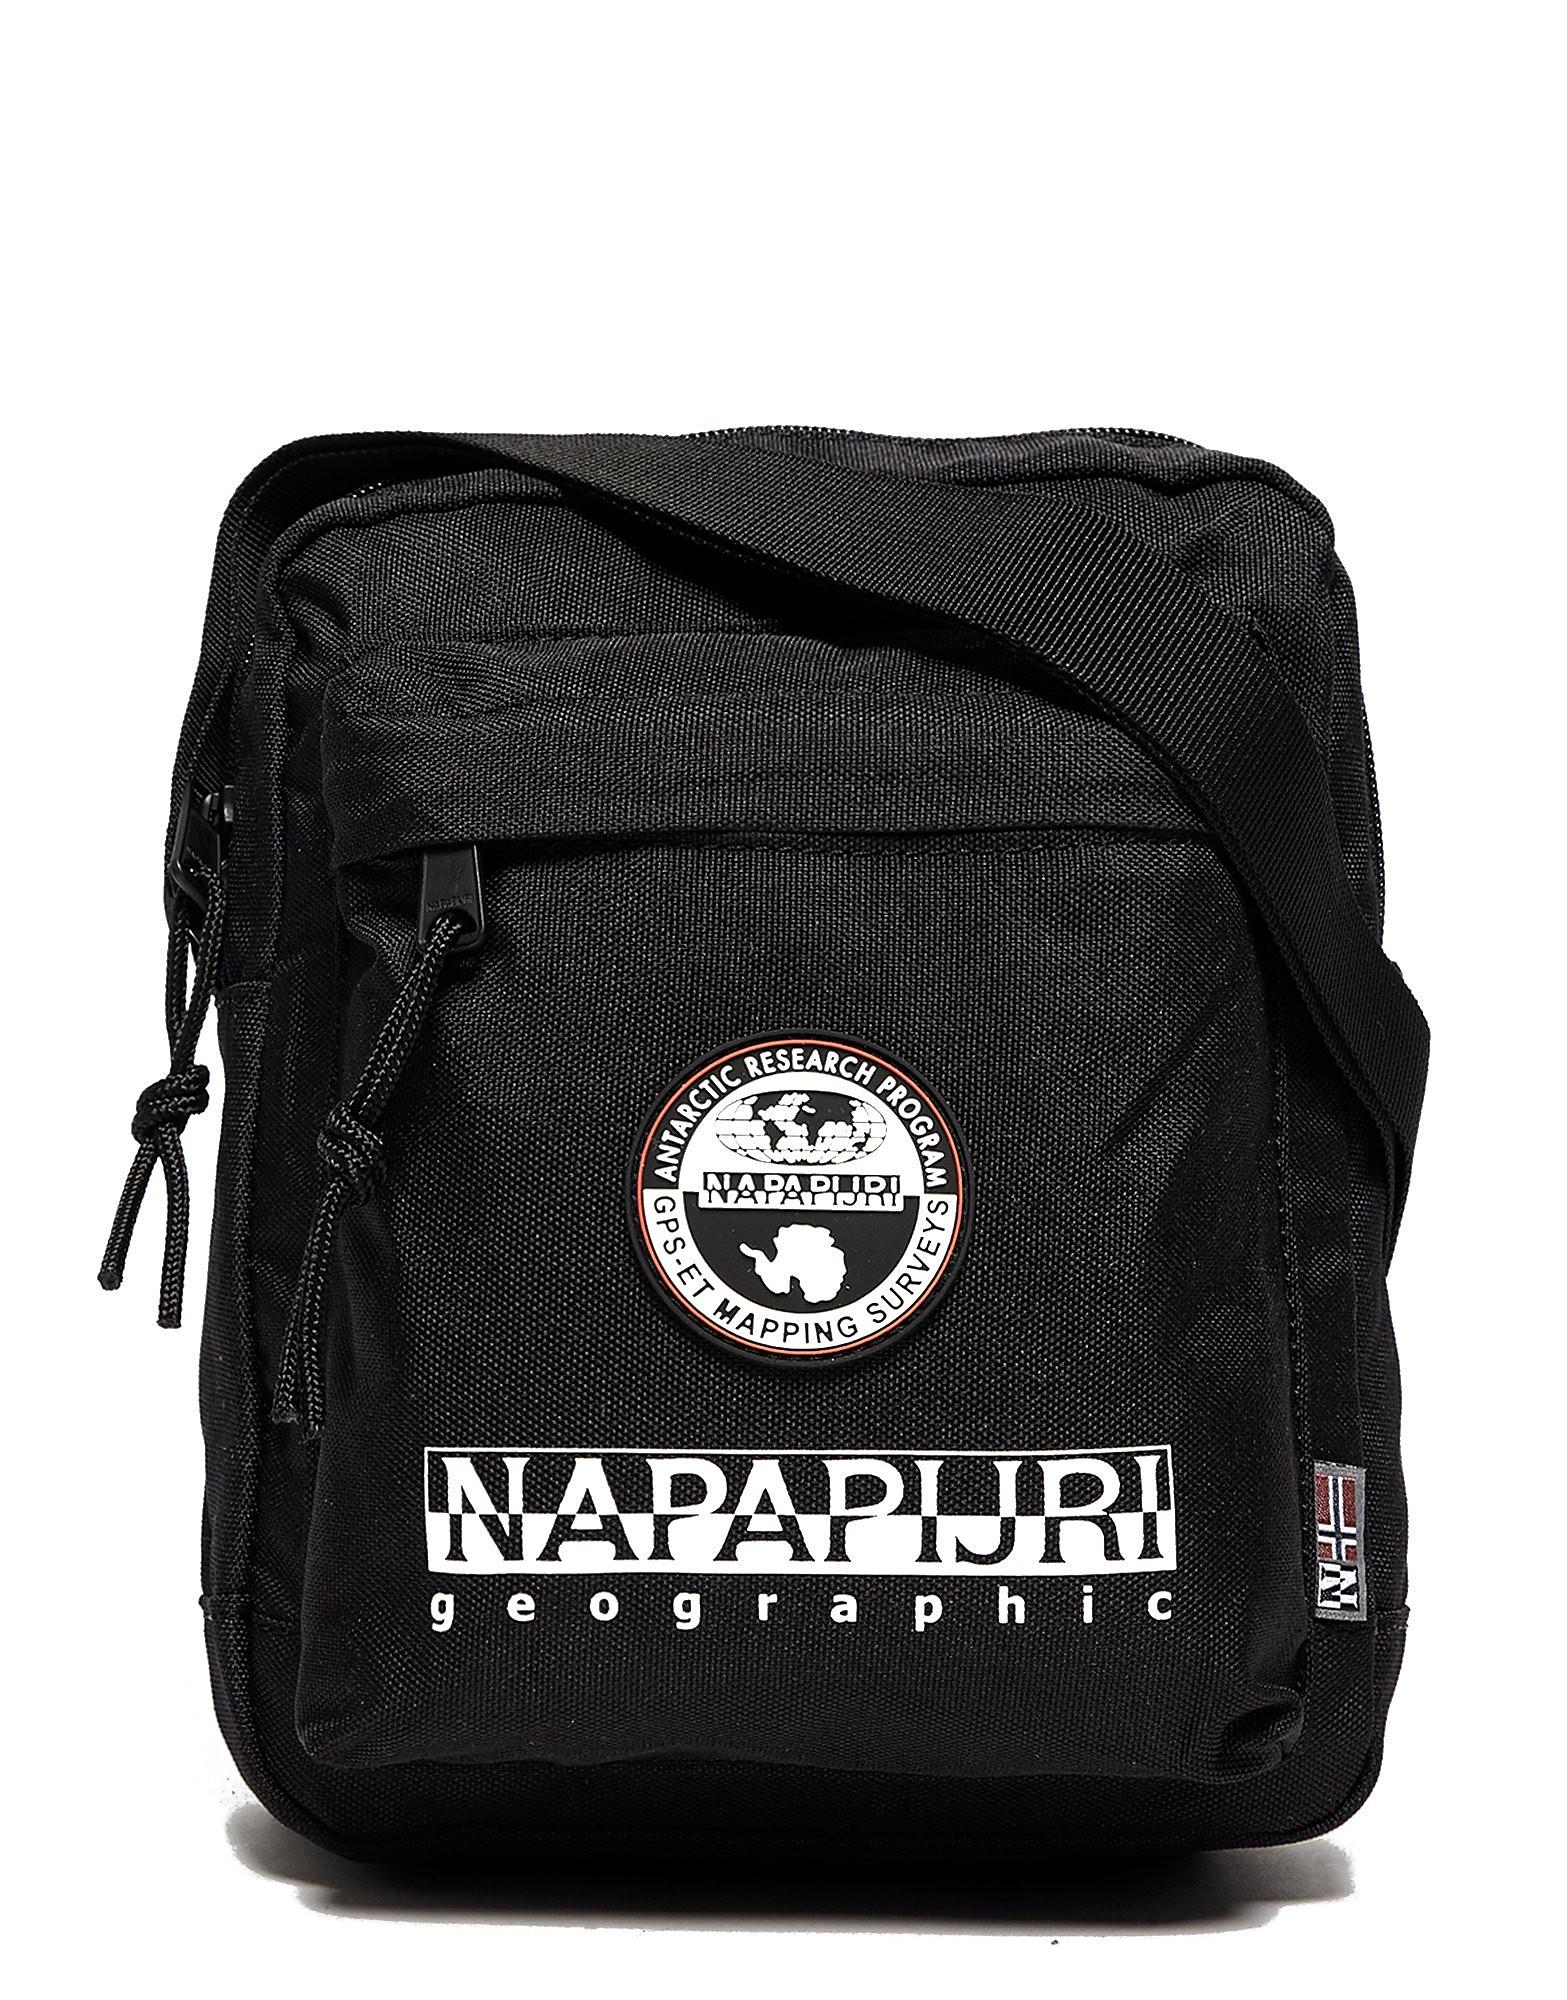 Napapijri Happy Cross Body Bag